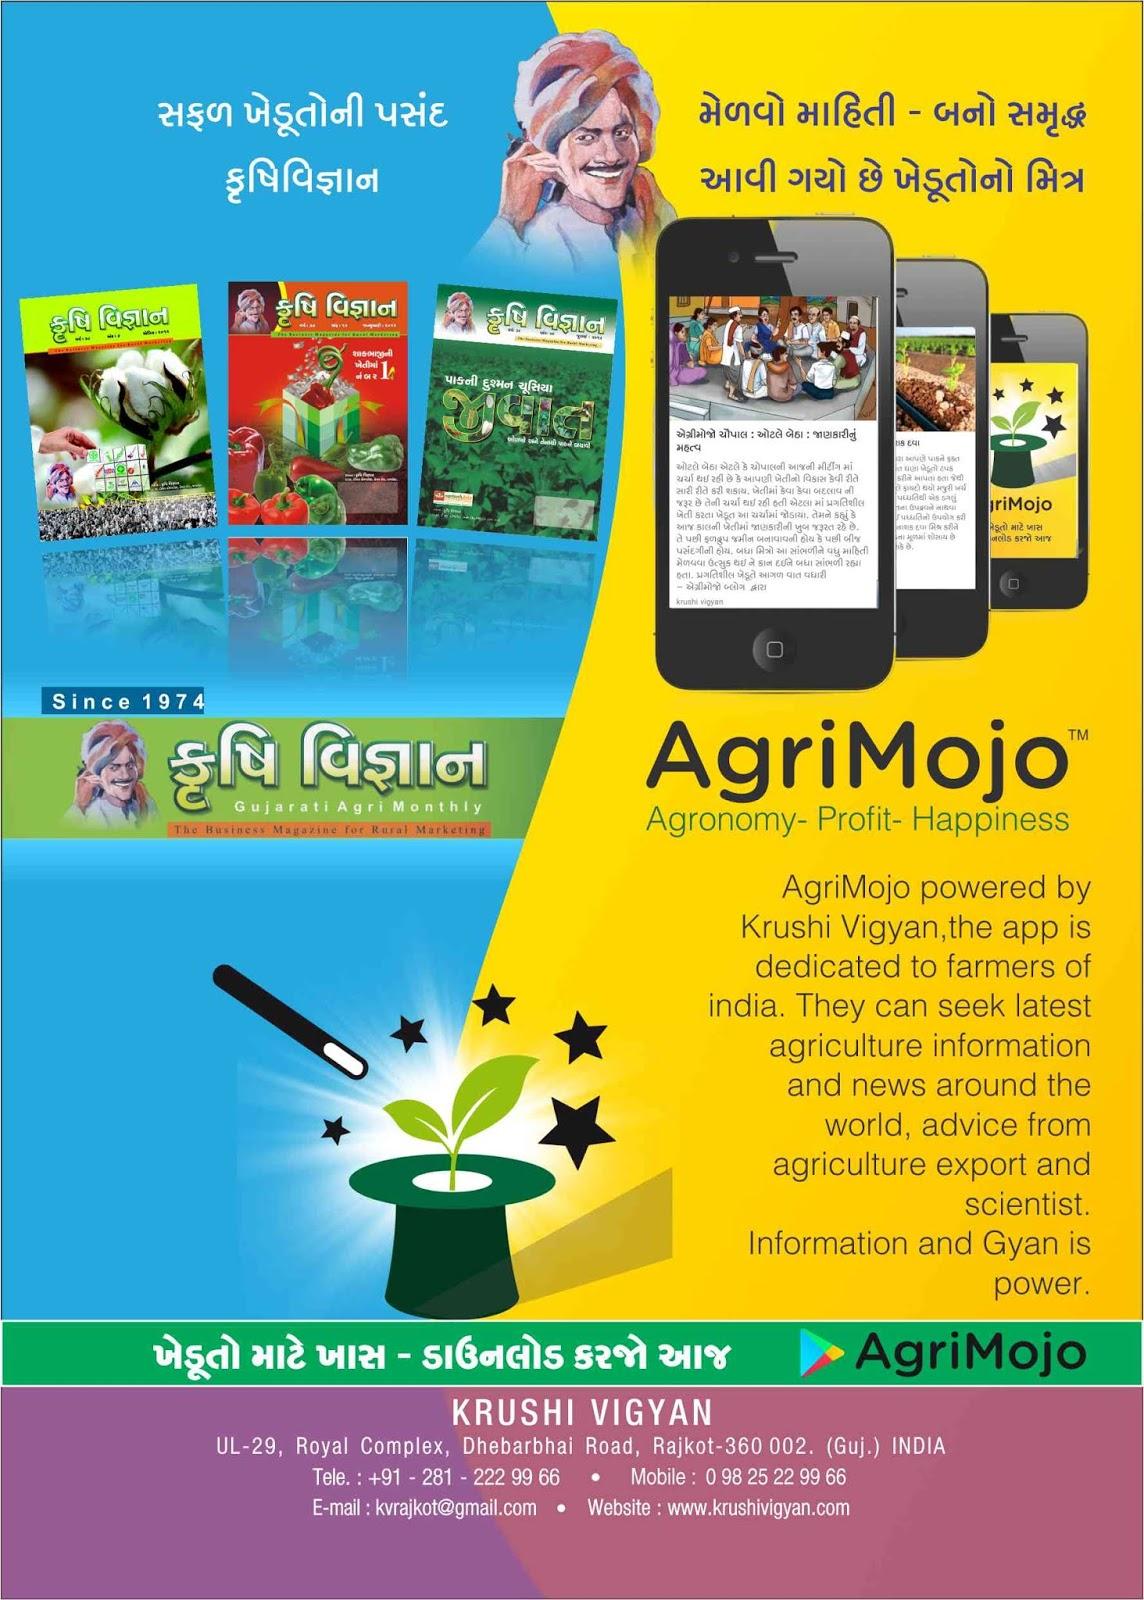 AGRIMOJO એપ ઇન્સ્ટોલ કરો. અને મેળવો ખેતીને લગતા ટૂંકા સમાચાર